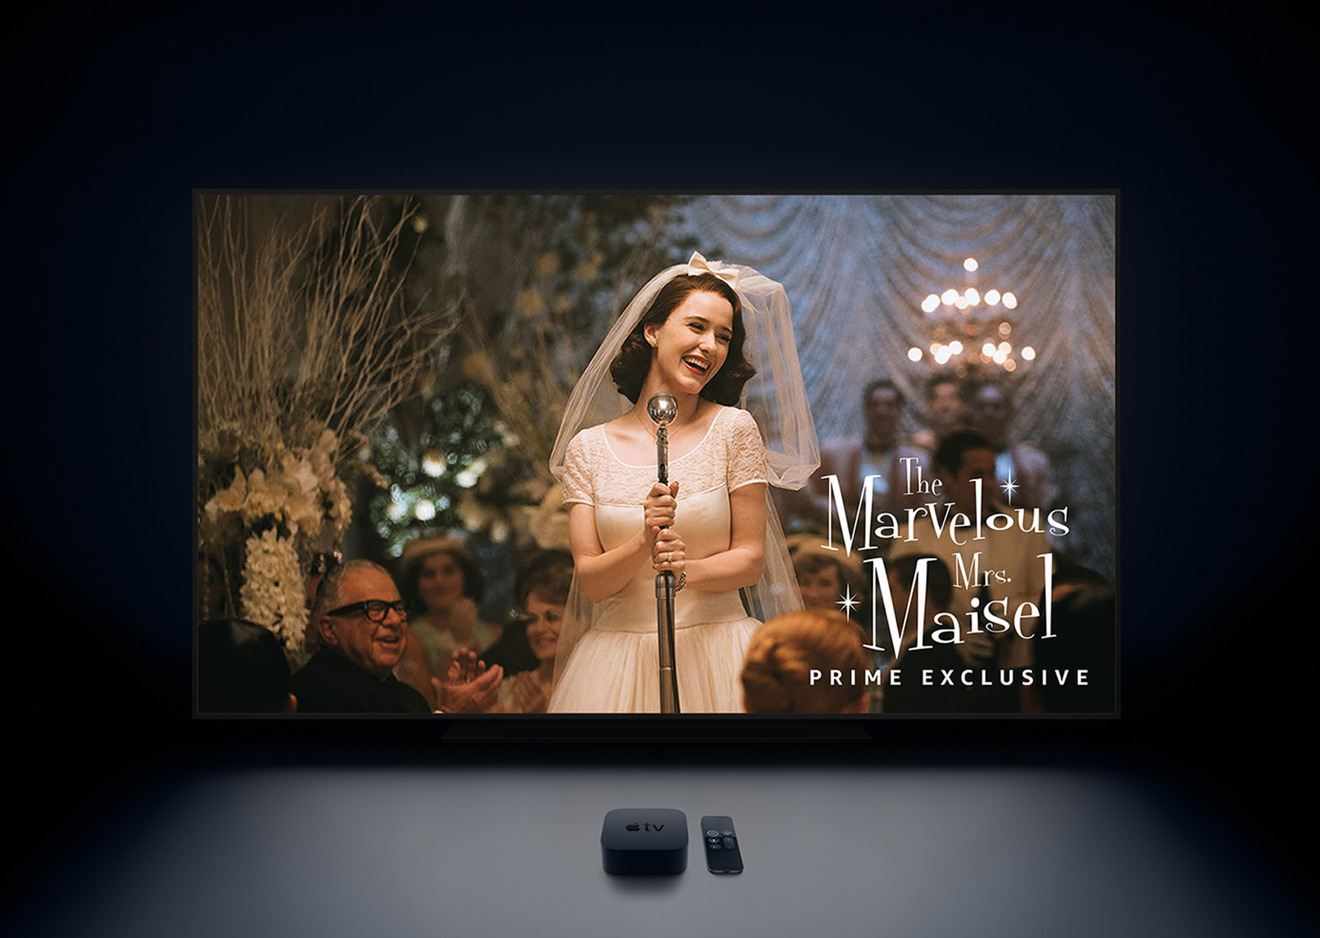 Amazon Prime Video on Apple TV 4K